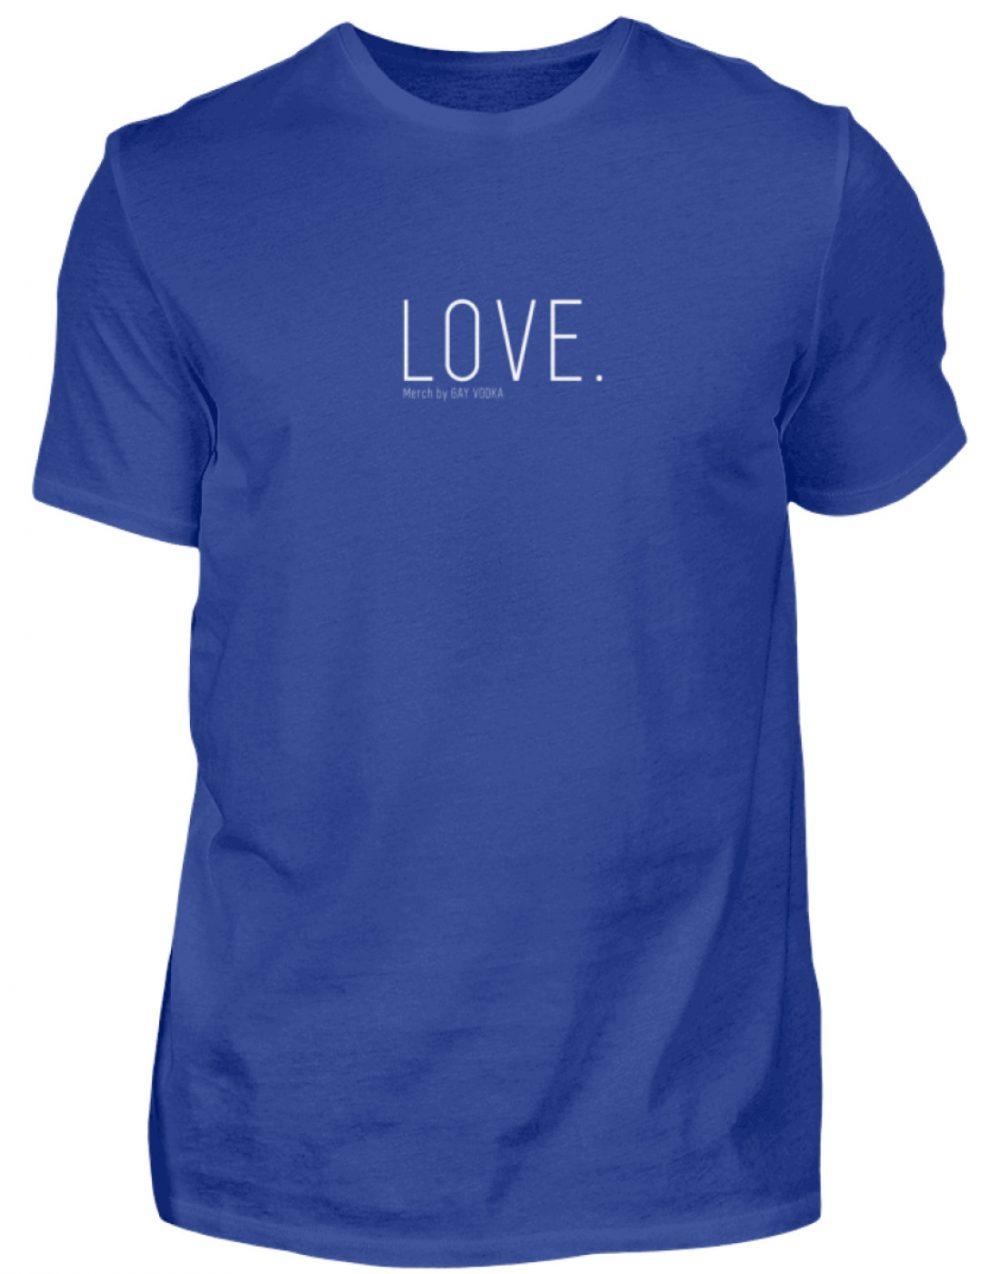 LOVE. - Herren Premiumshirt-27